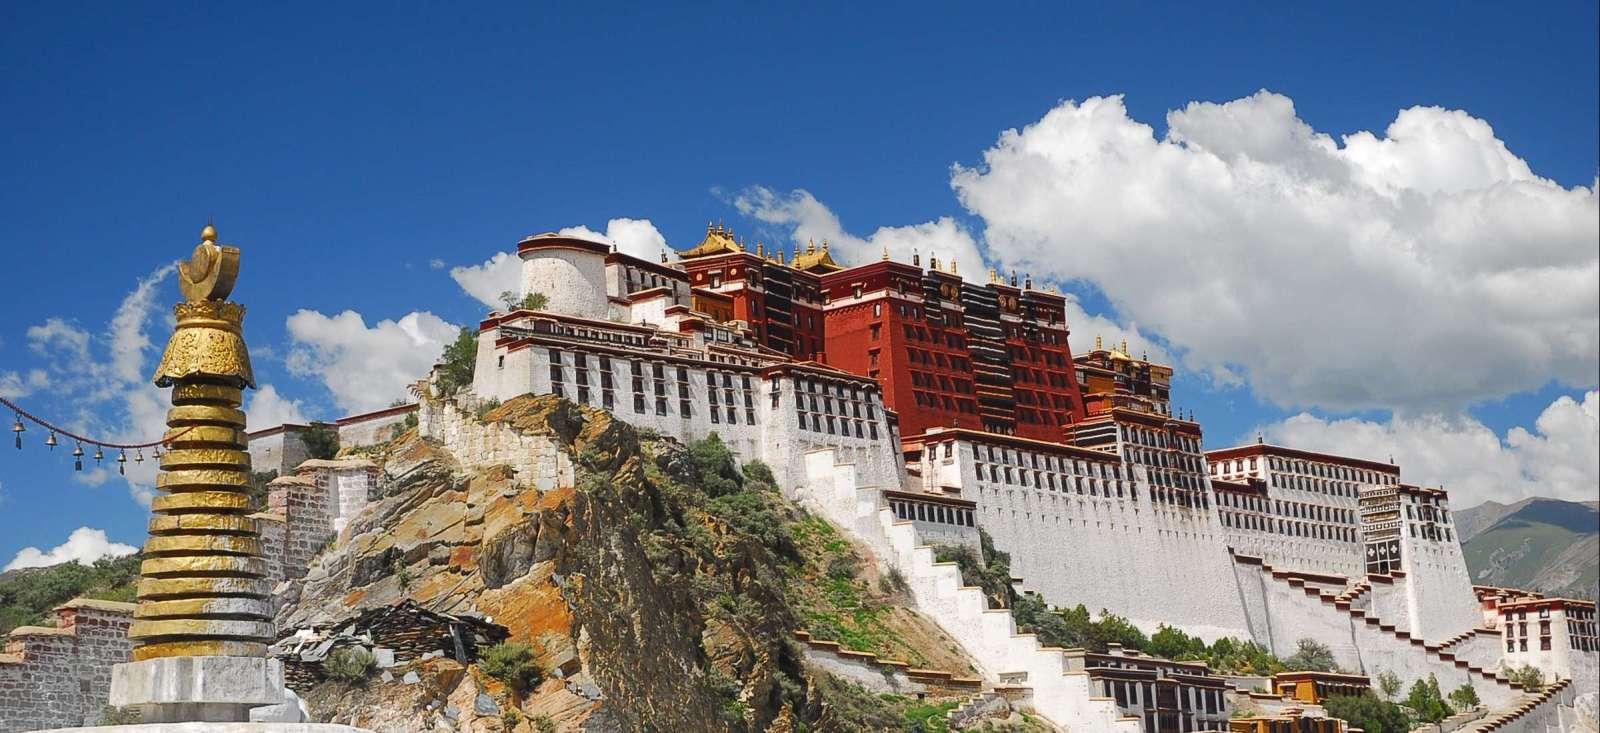 Voyage à pied : Balade Tibétaine